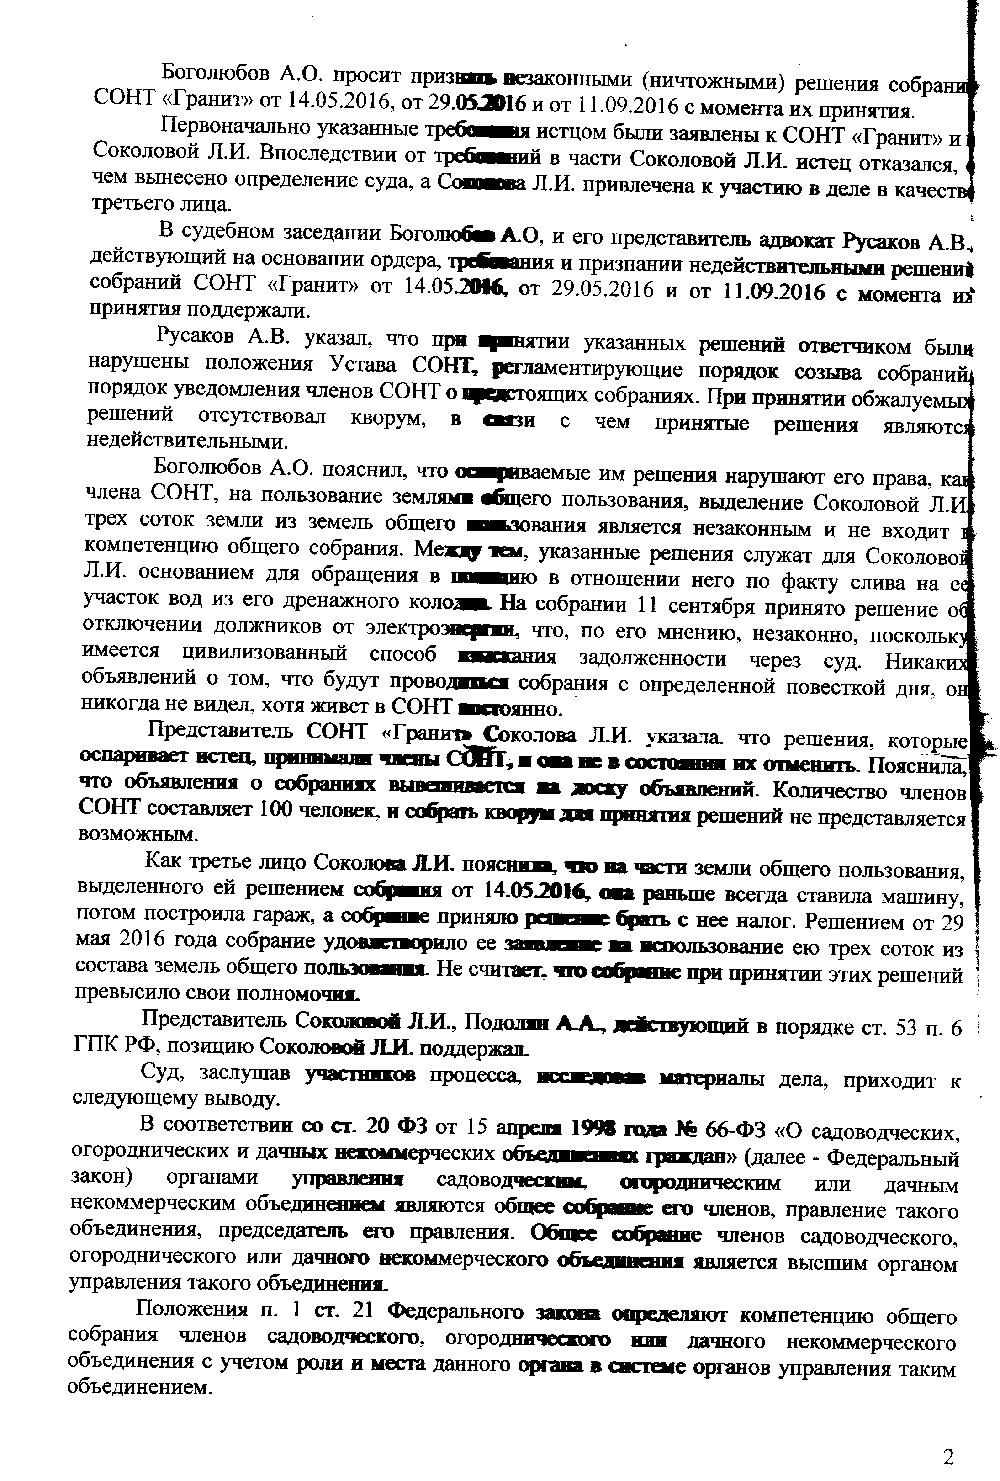 https://sontgranit.ru/forum/img/sokol/решение3.png